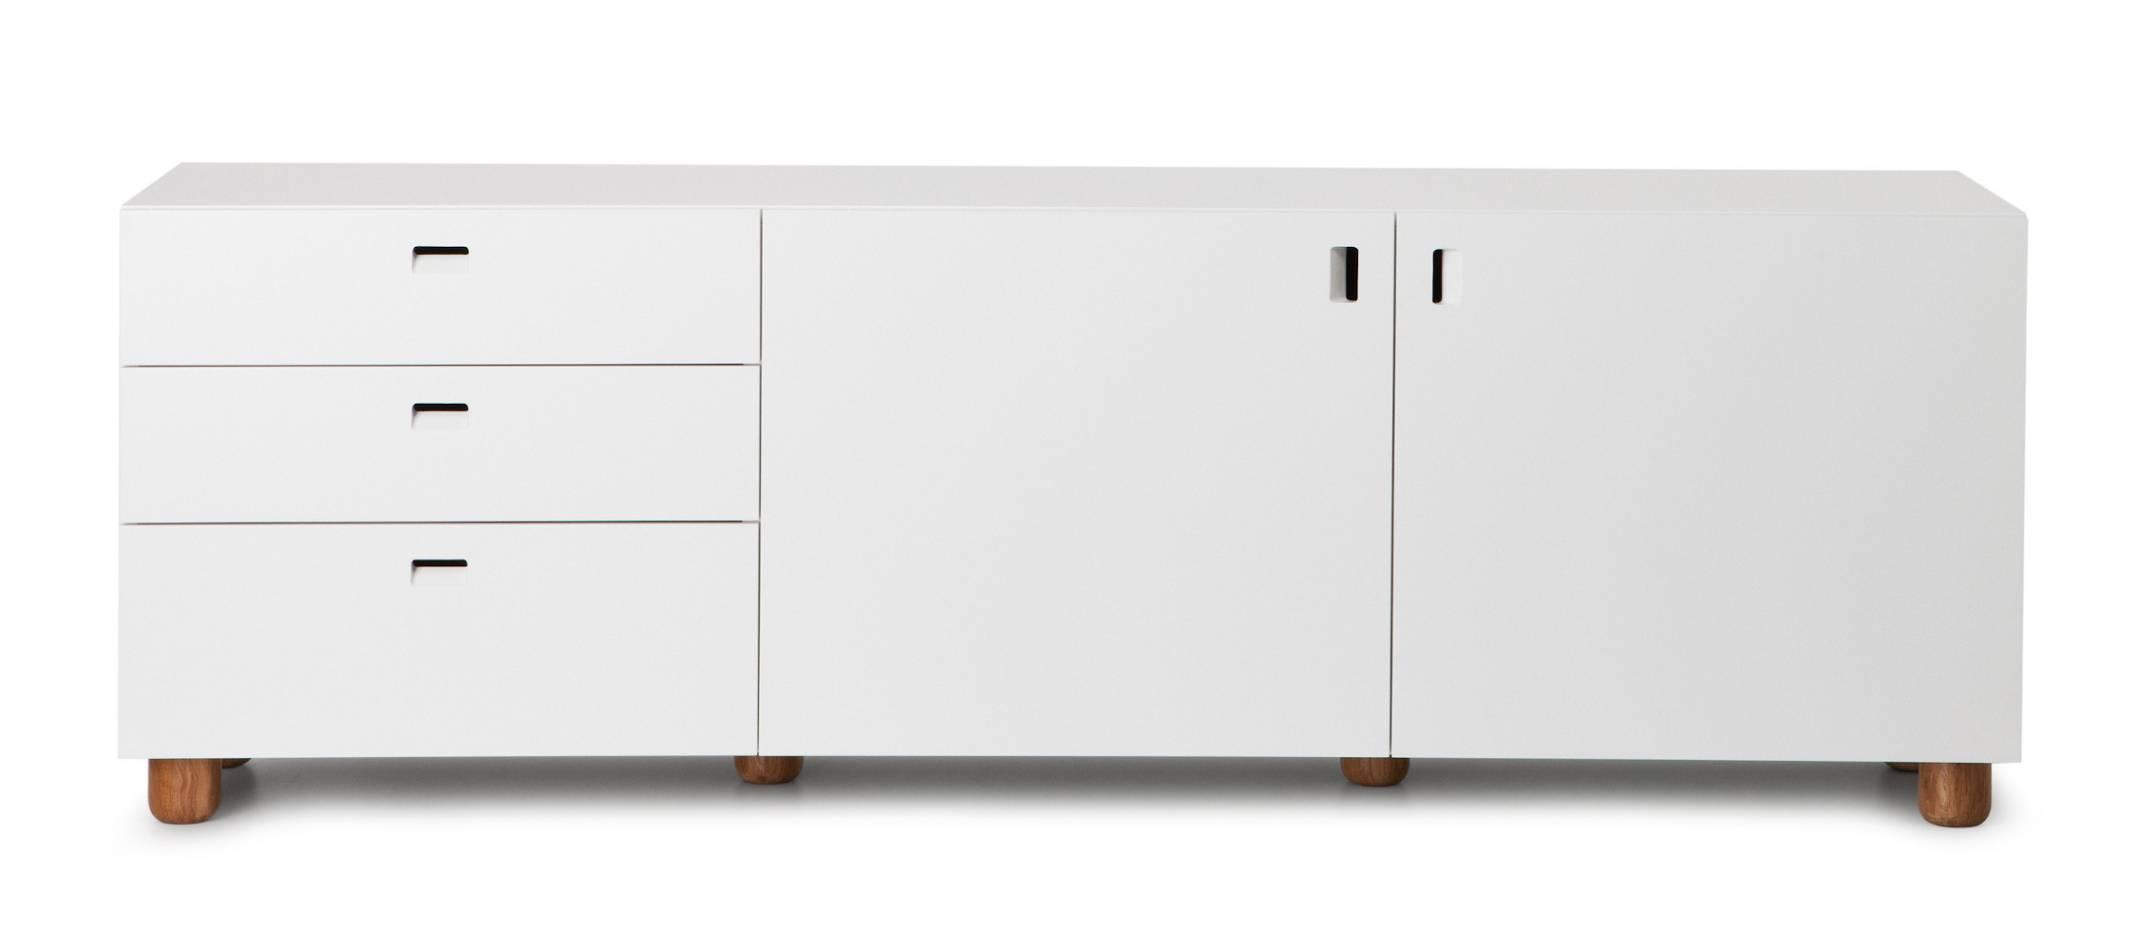 Quodes Satellite Sideboard Design by Edward Barber und Jay Osgerby Design Möbel